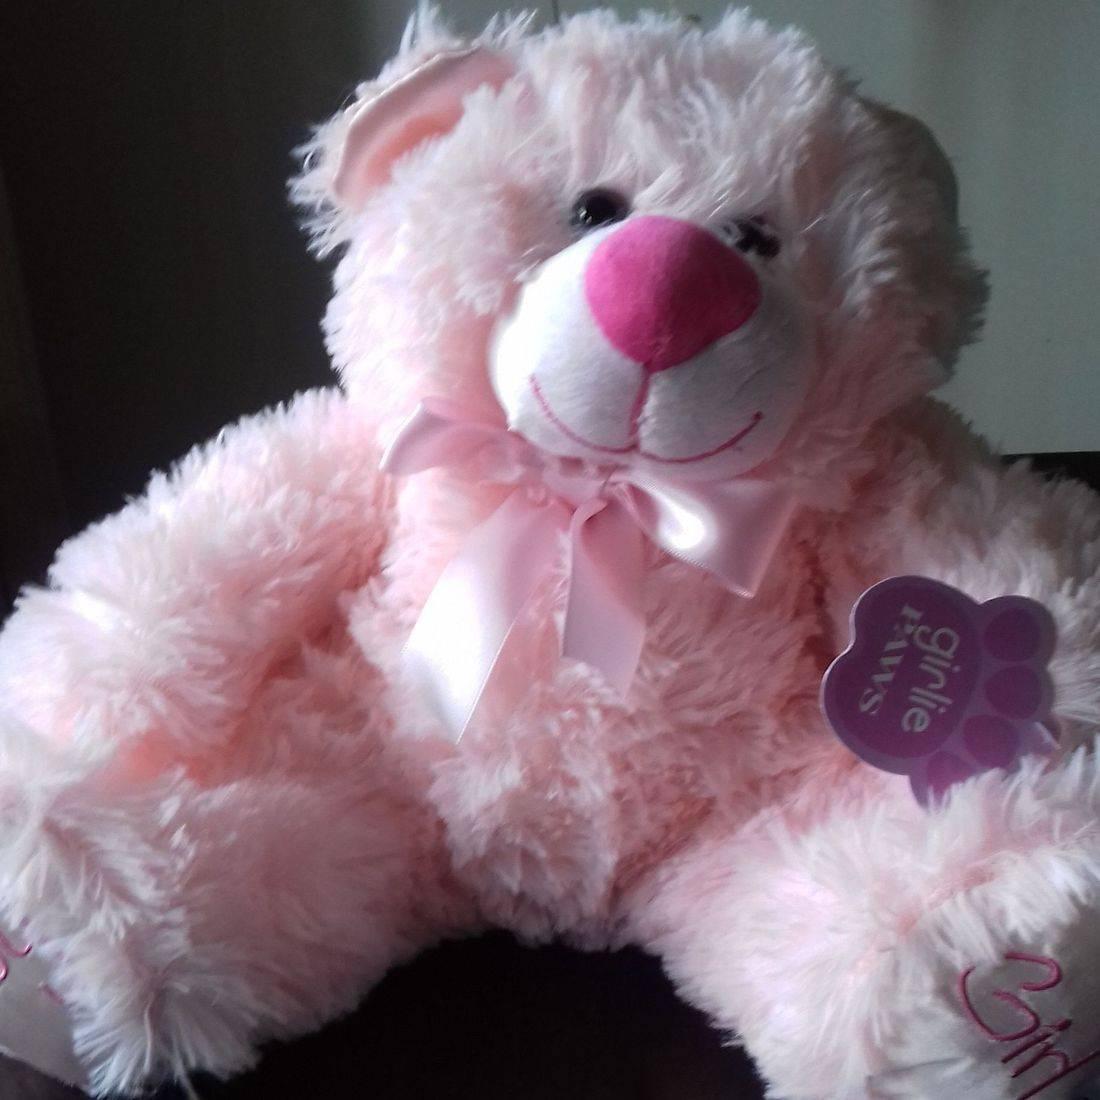 Pink cuddly bear